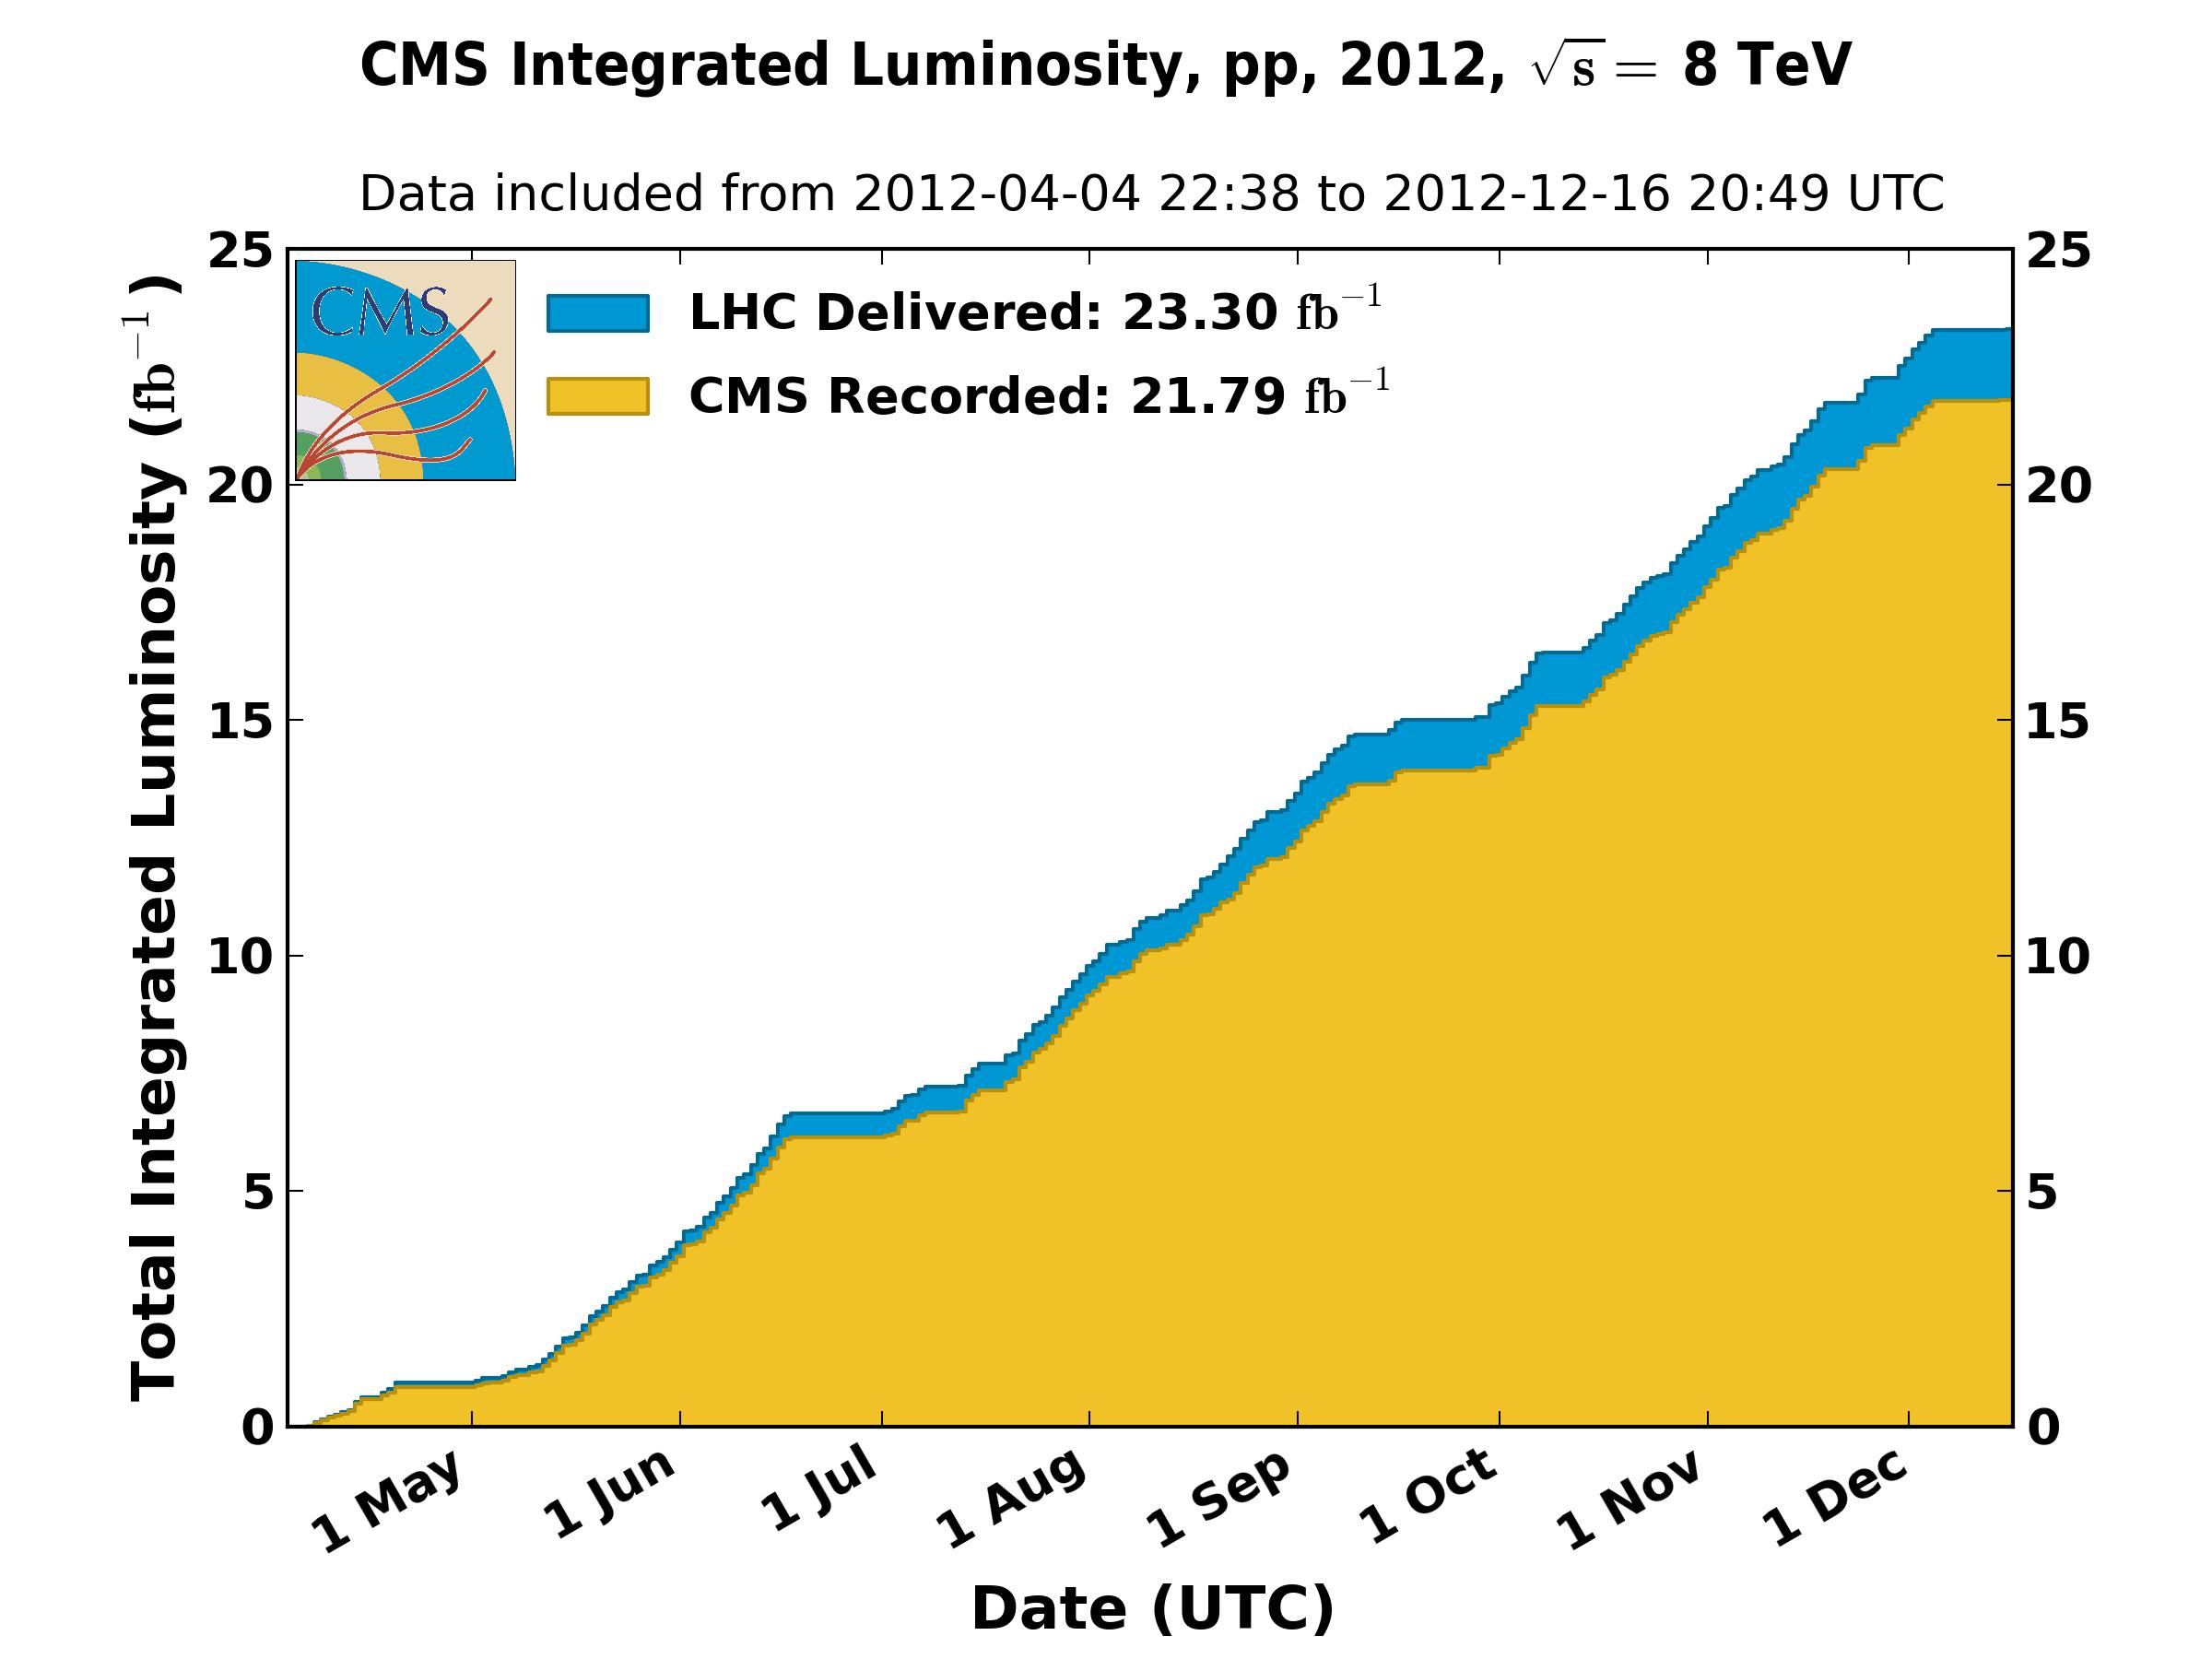 https://cern.ch/cmslumi/publicplots/int_lumi_per_day_cumulative_pp_2012.png